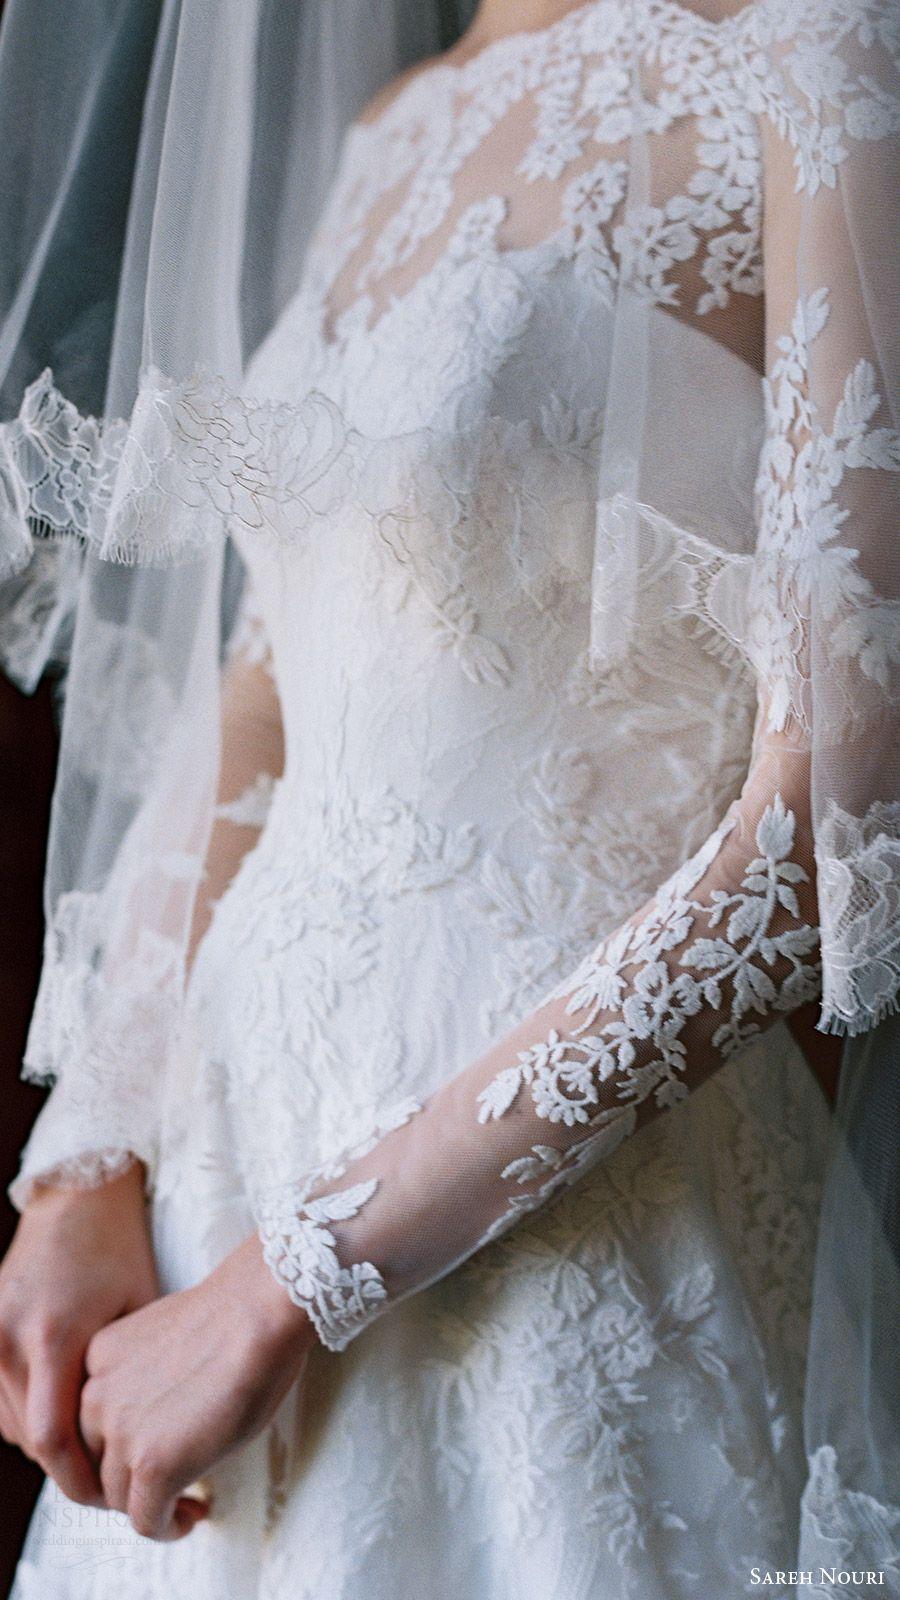 Sareh nouri bridal spring wedding dresses wedding dress veil